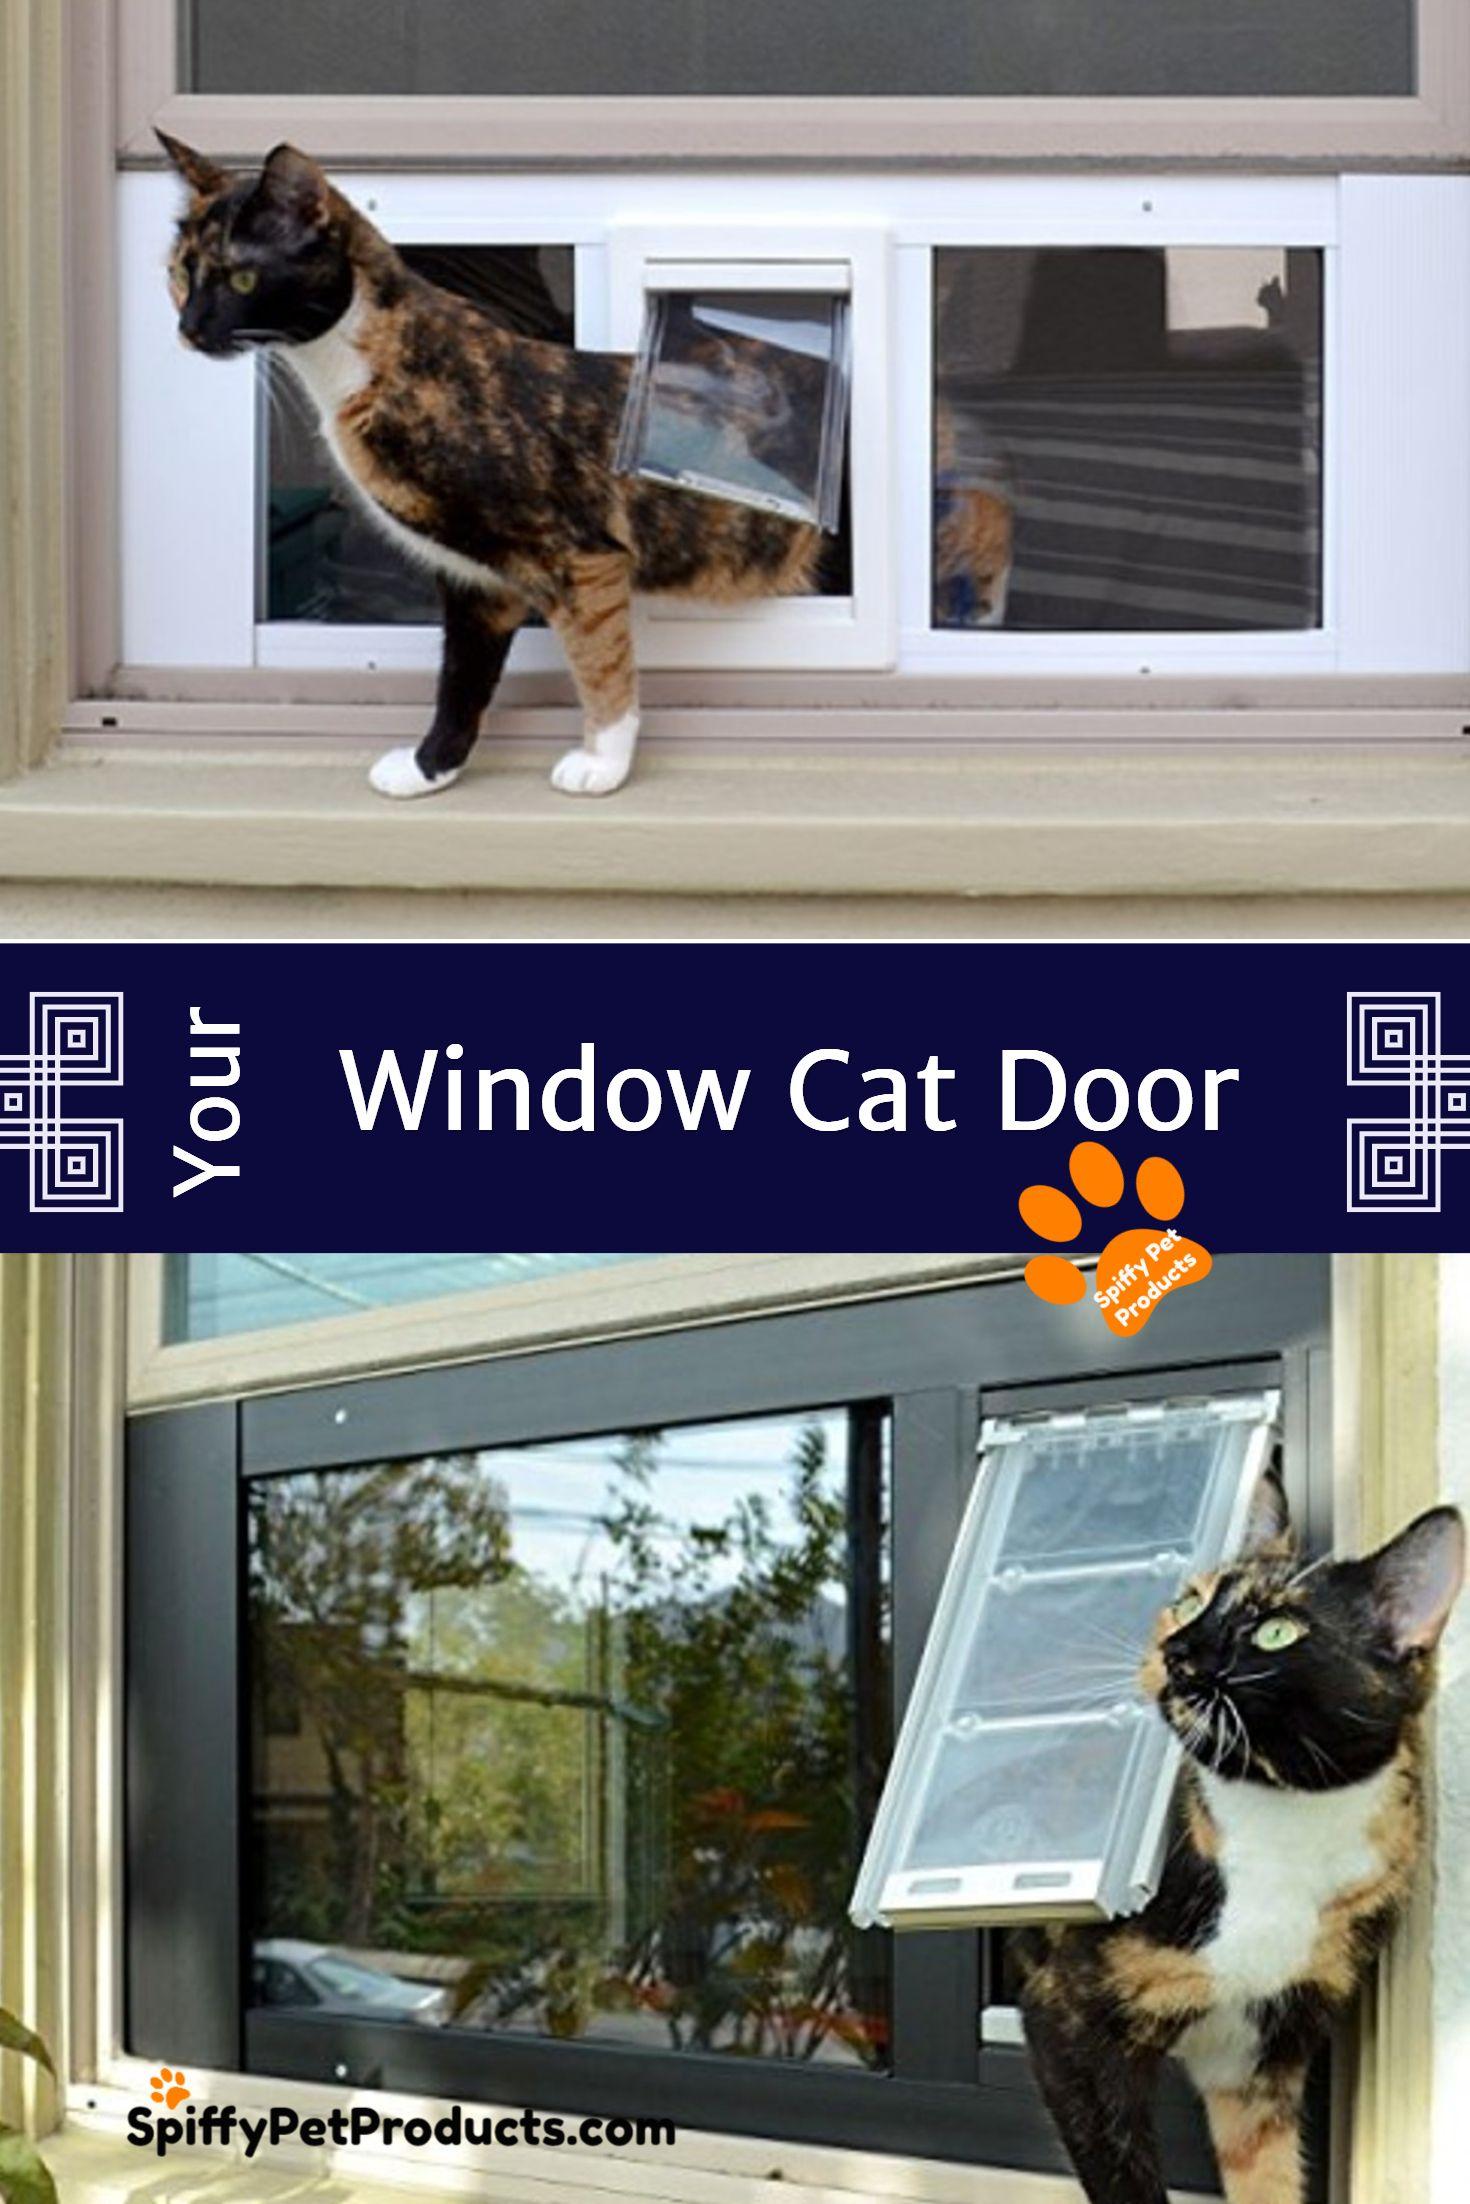 Window Mounted Cat Doors Rule